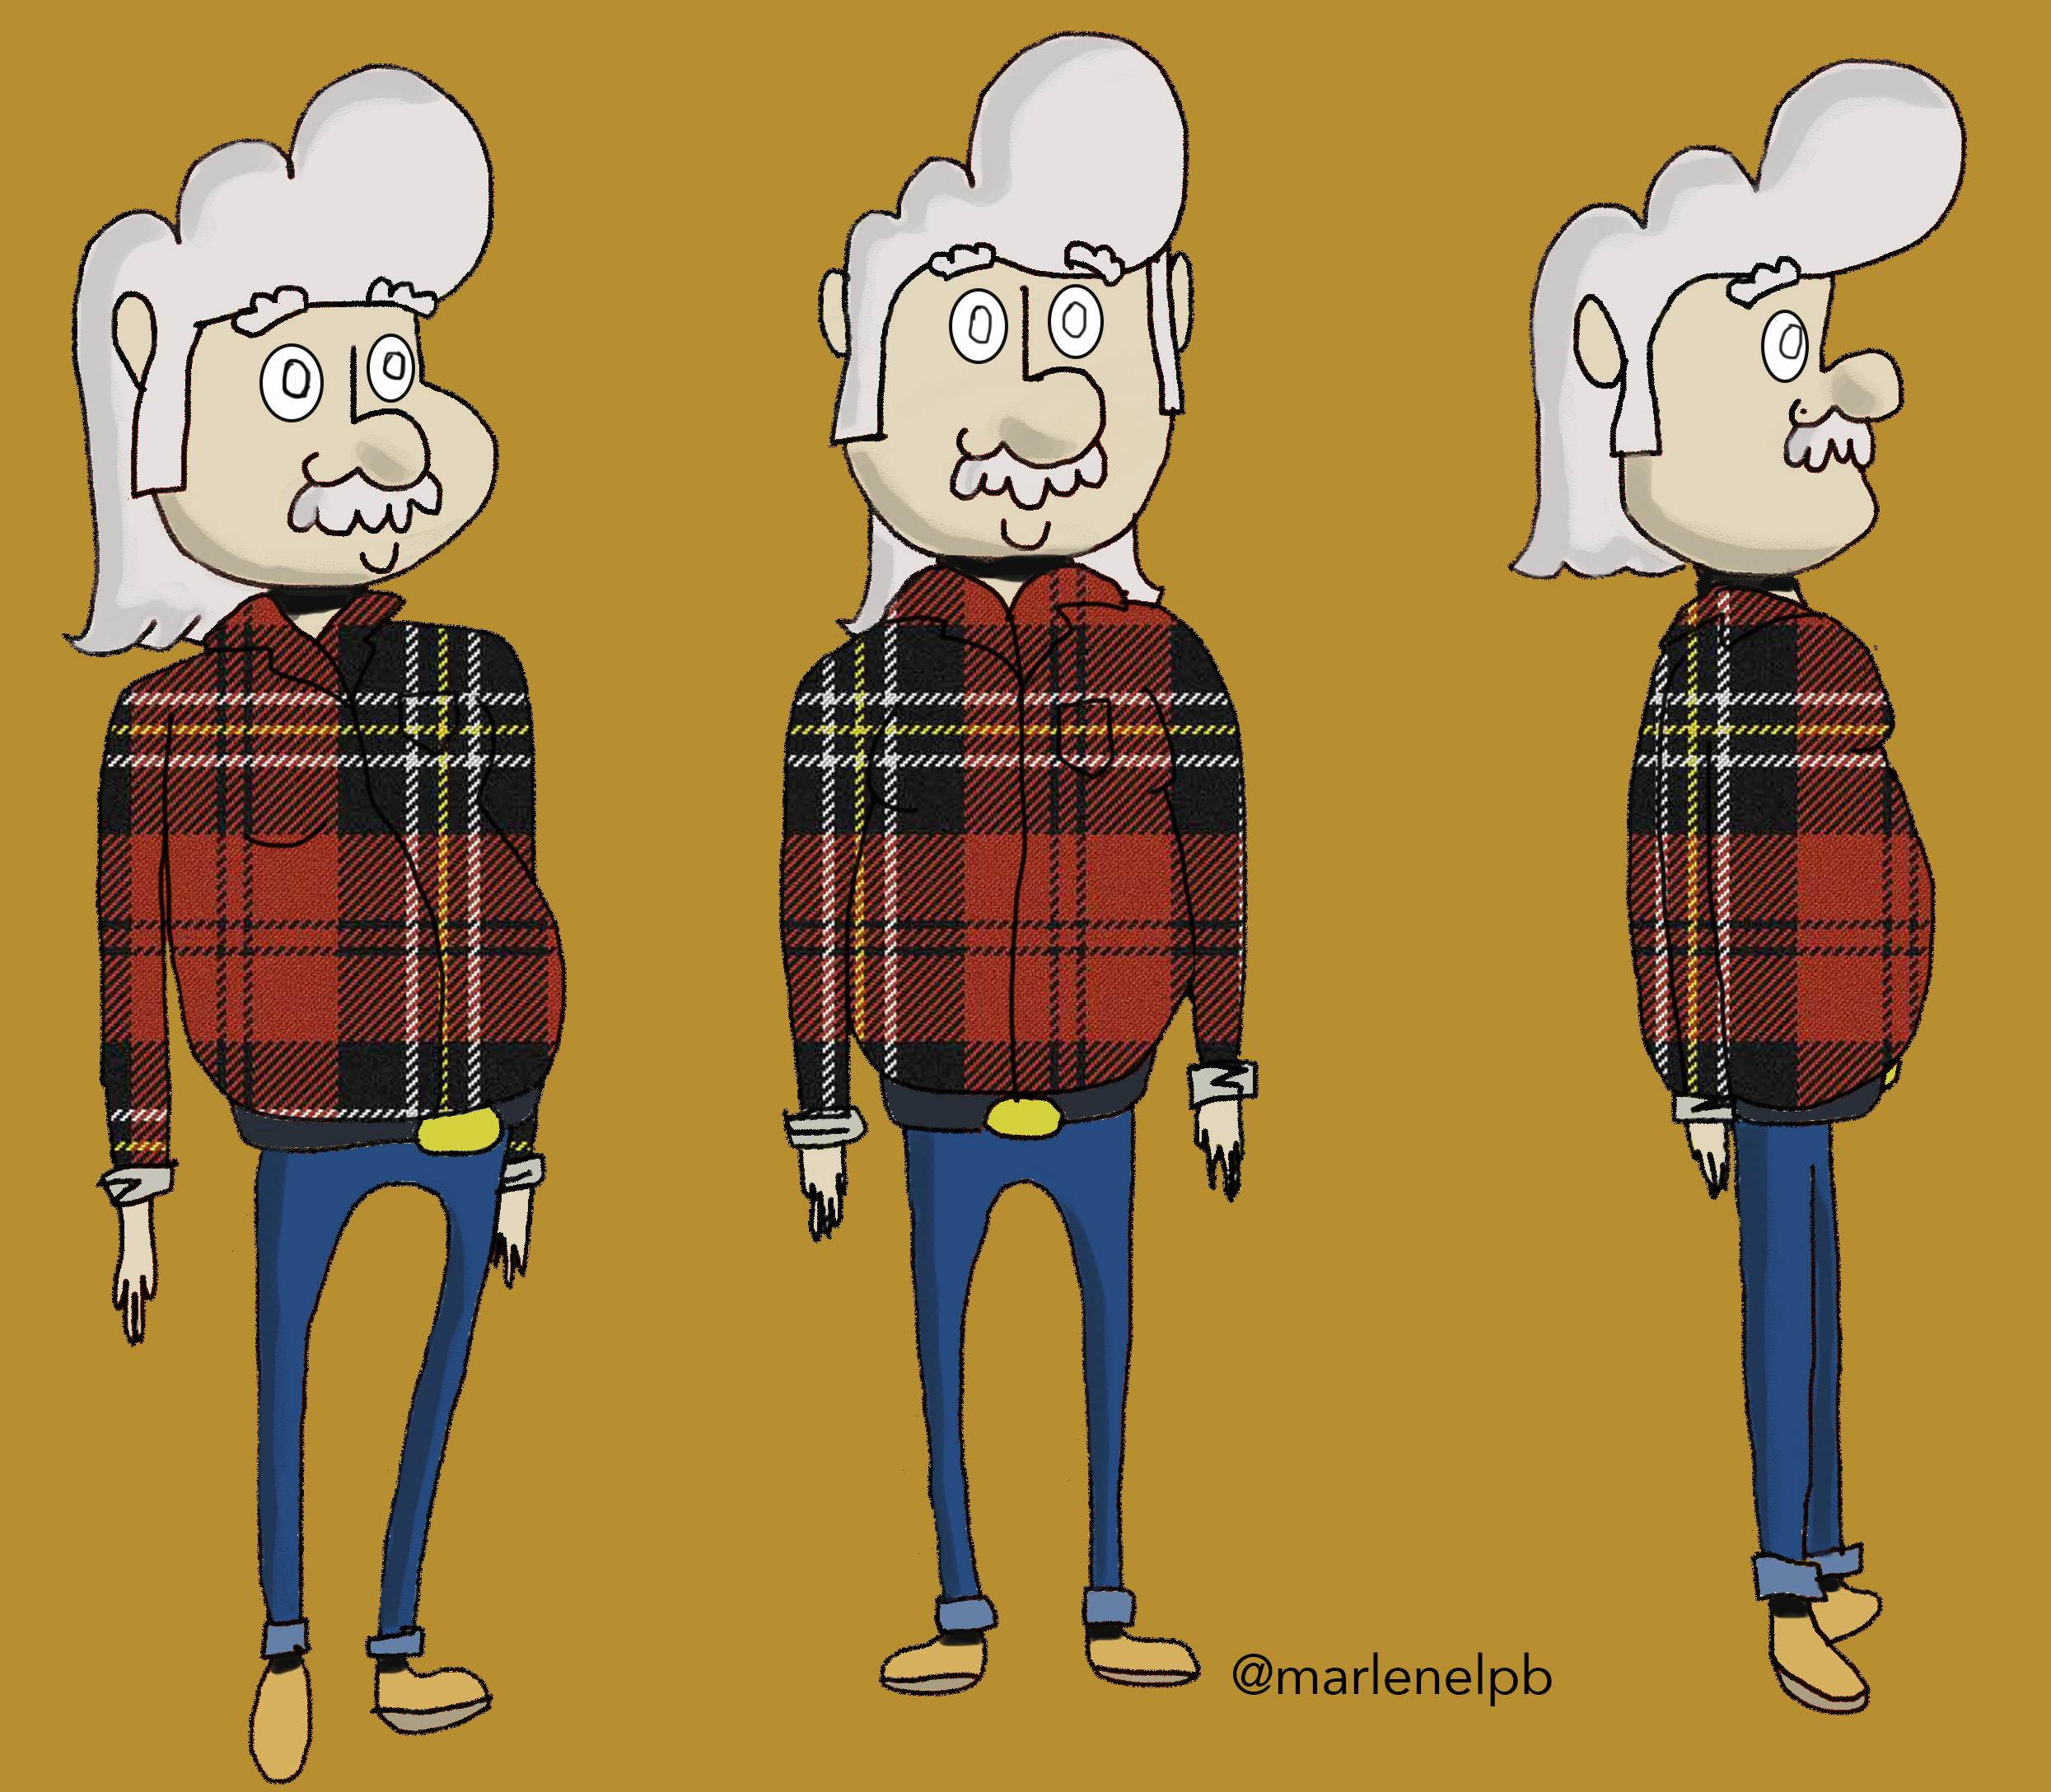 Uncle Charlie for CLOUDTOWN Cartoon concept. 2017.